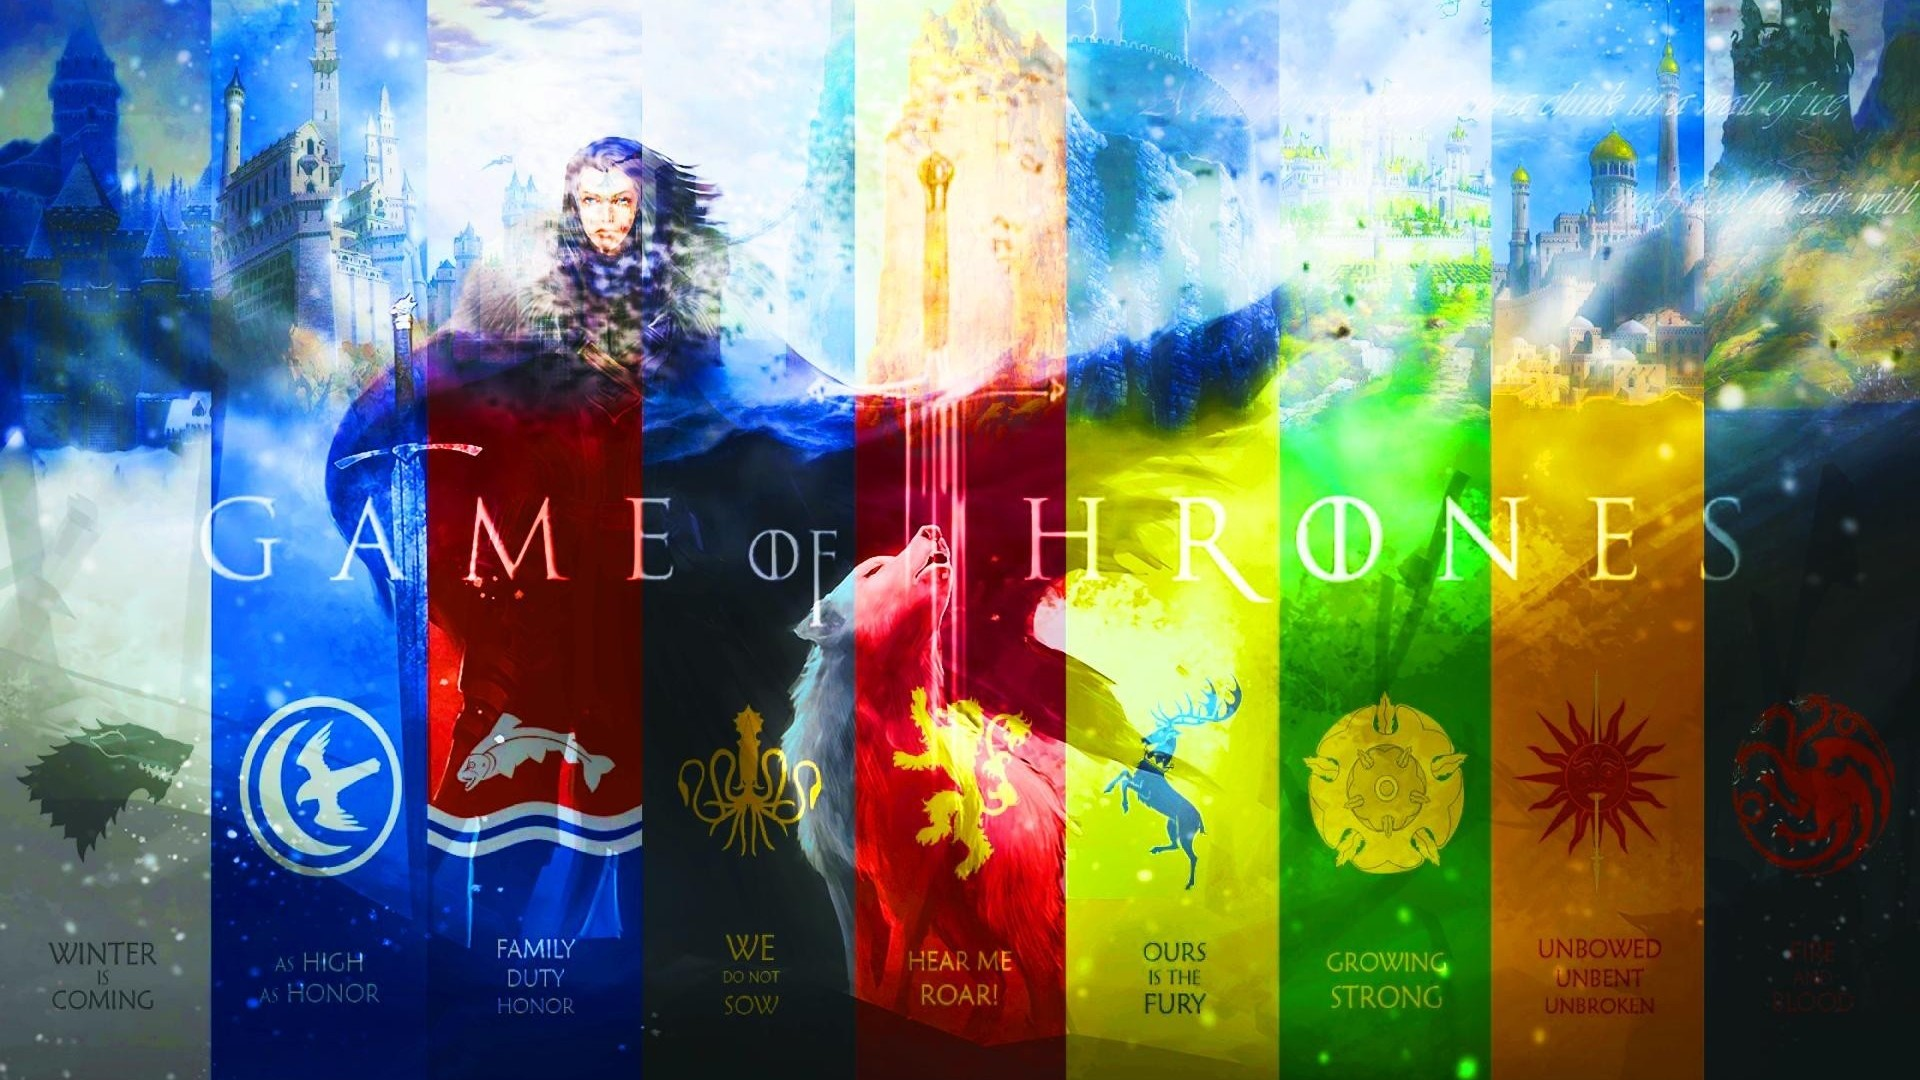 Game of Thrones Desktop Backgrounds   Wallpaper High Definition High 1920x1080